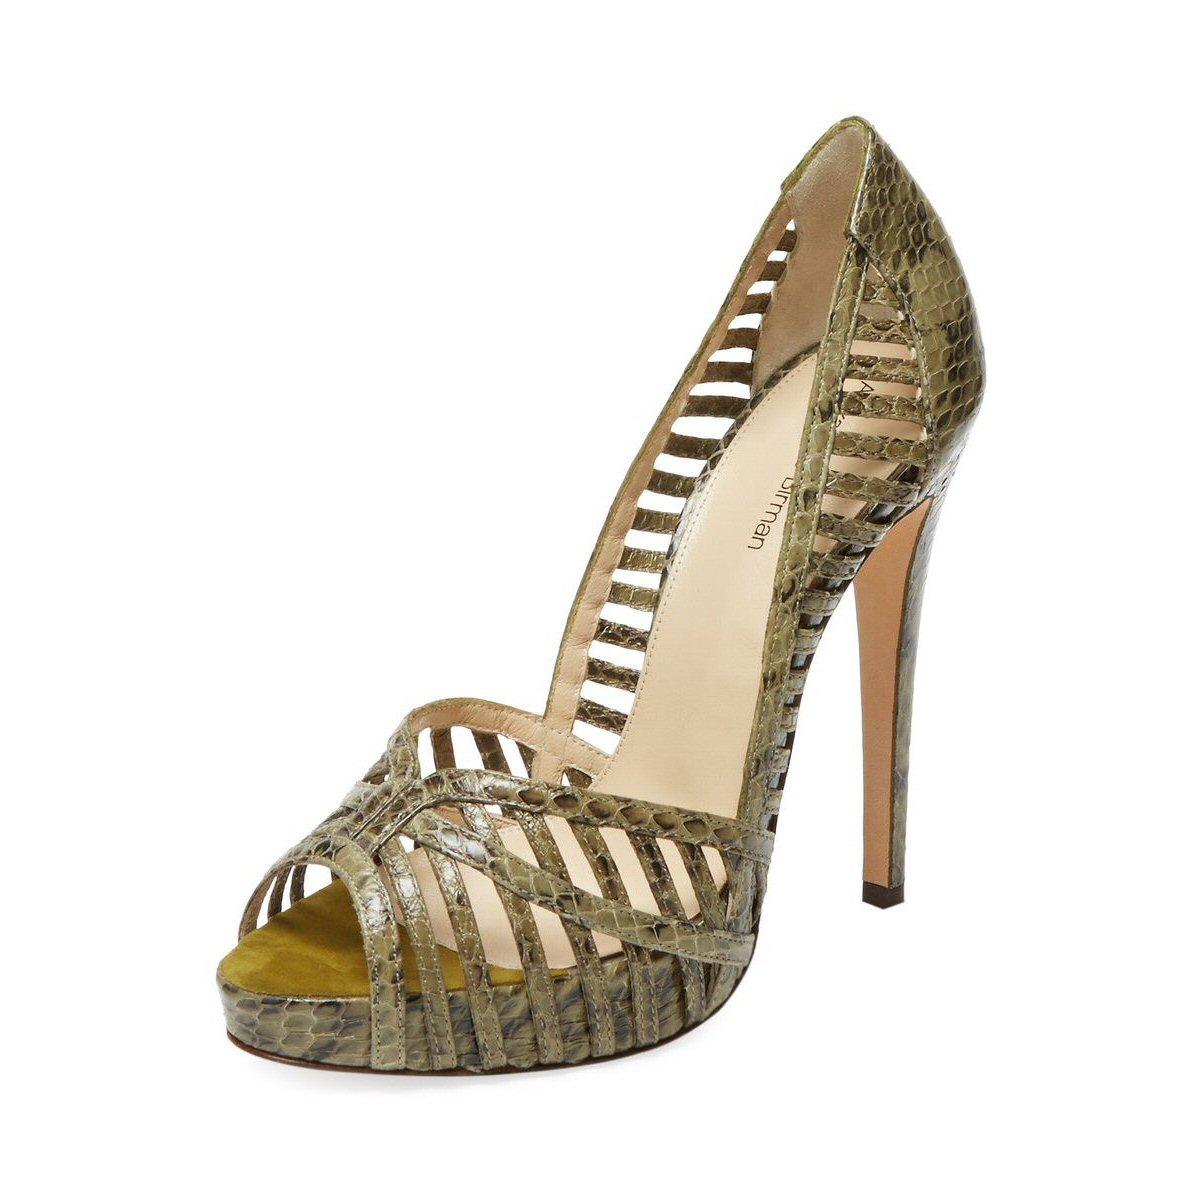 Birman Snakeskin Sandals-06